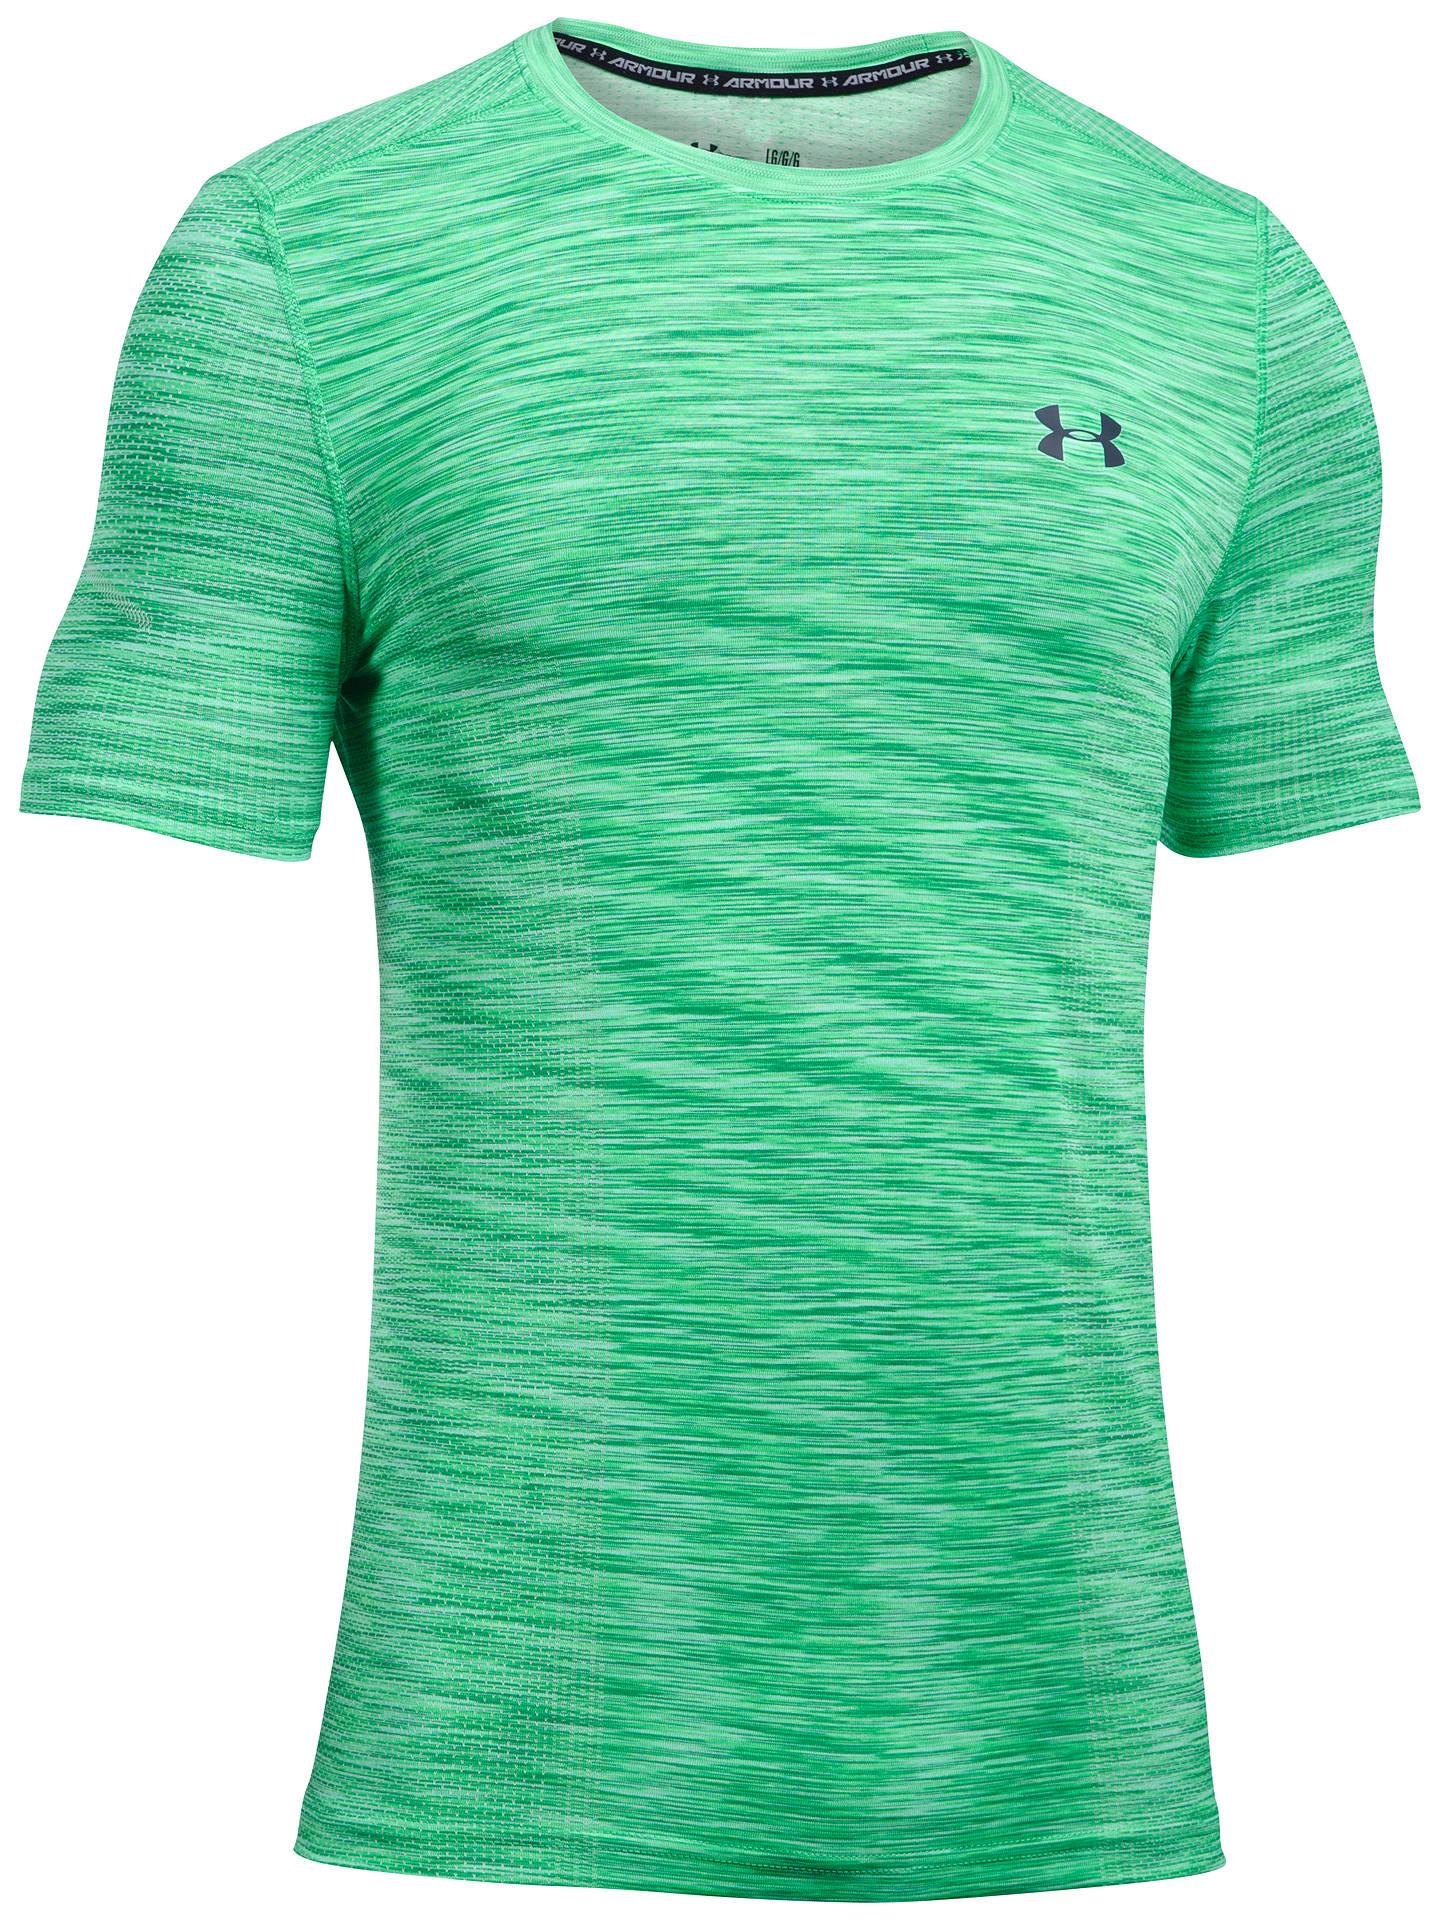 9202425a6 Buy Under Armour Threadborne Seamless T-Shirt, Green, S Online at johnlewis.